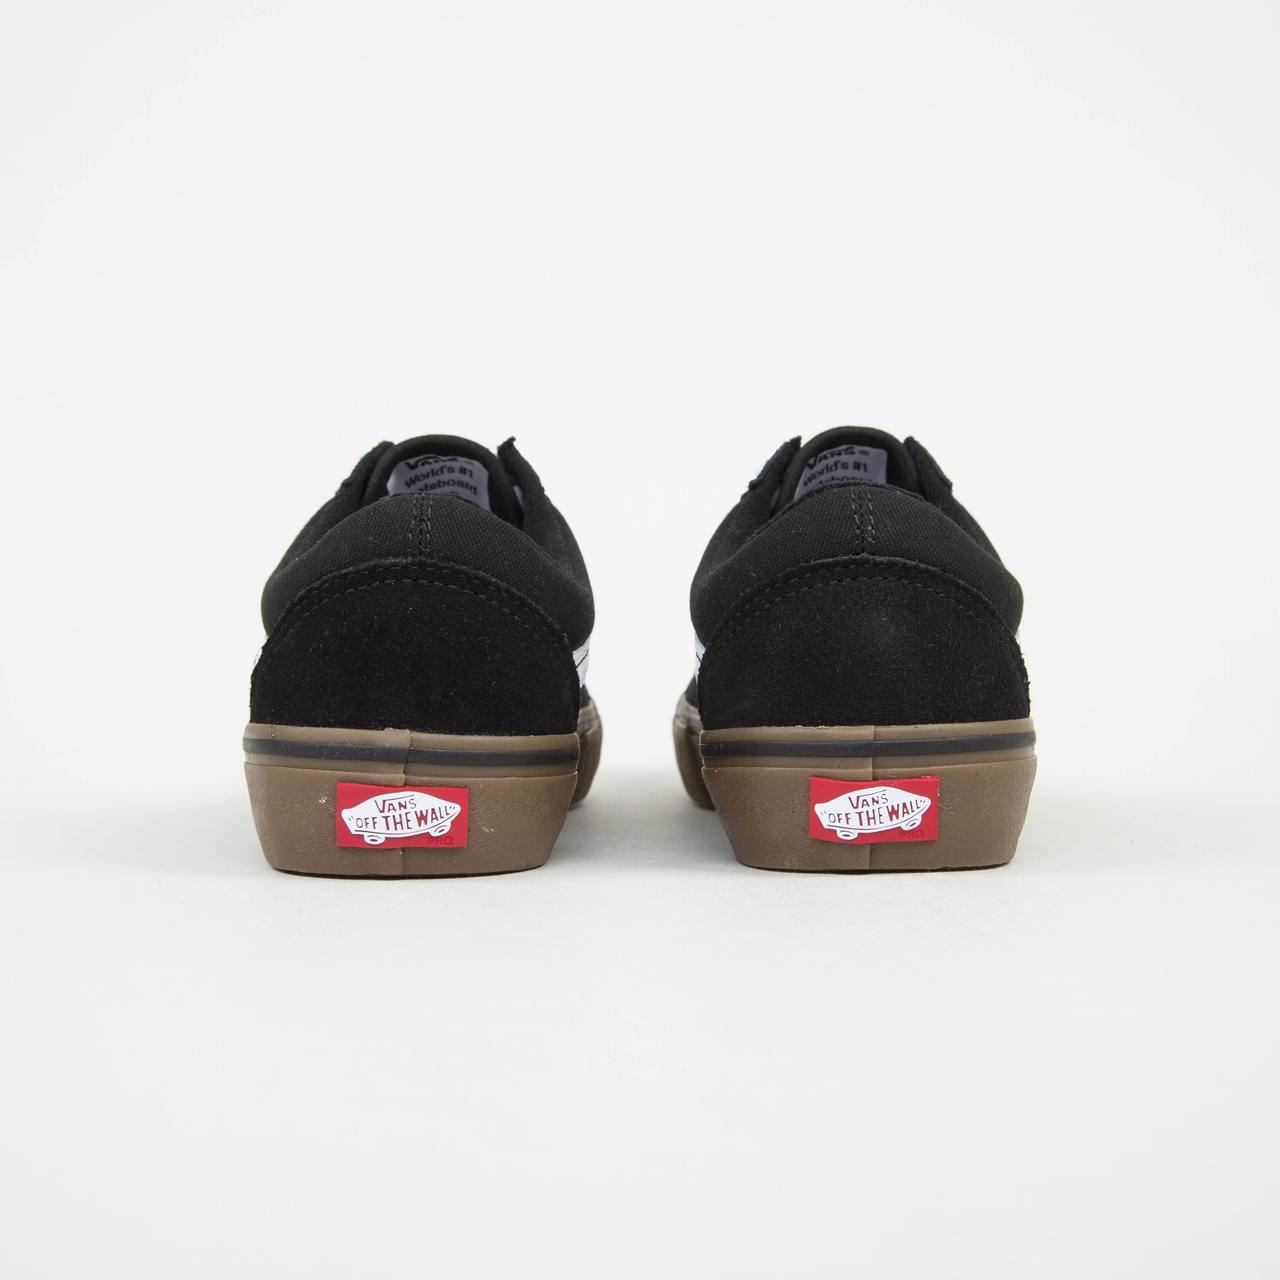 d18a3d3b4d Vans Old Skool Pro Skate Shoes - Black White Gum. Price  £64.95. Image 1.  Larger   More Photos